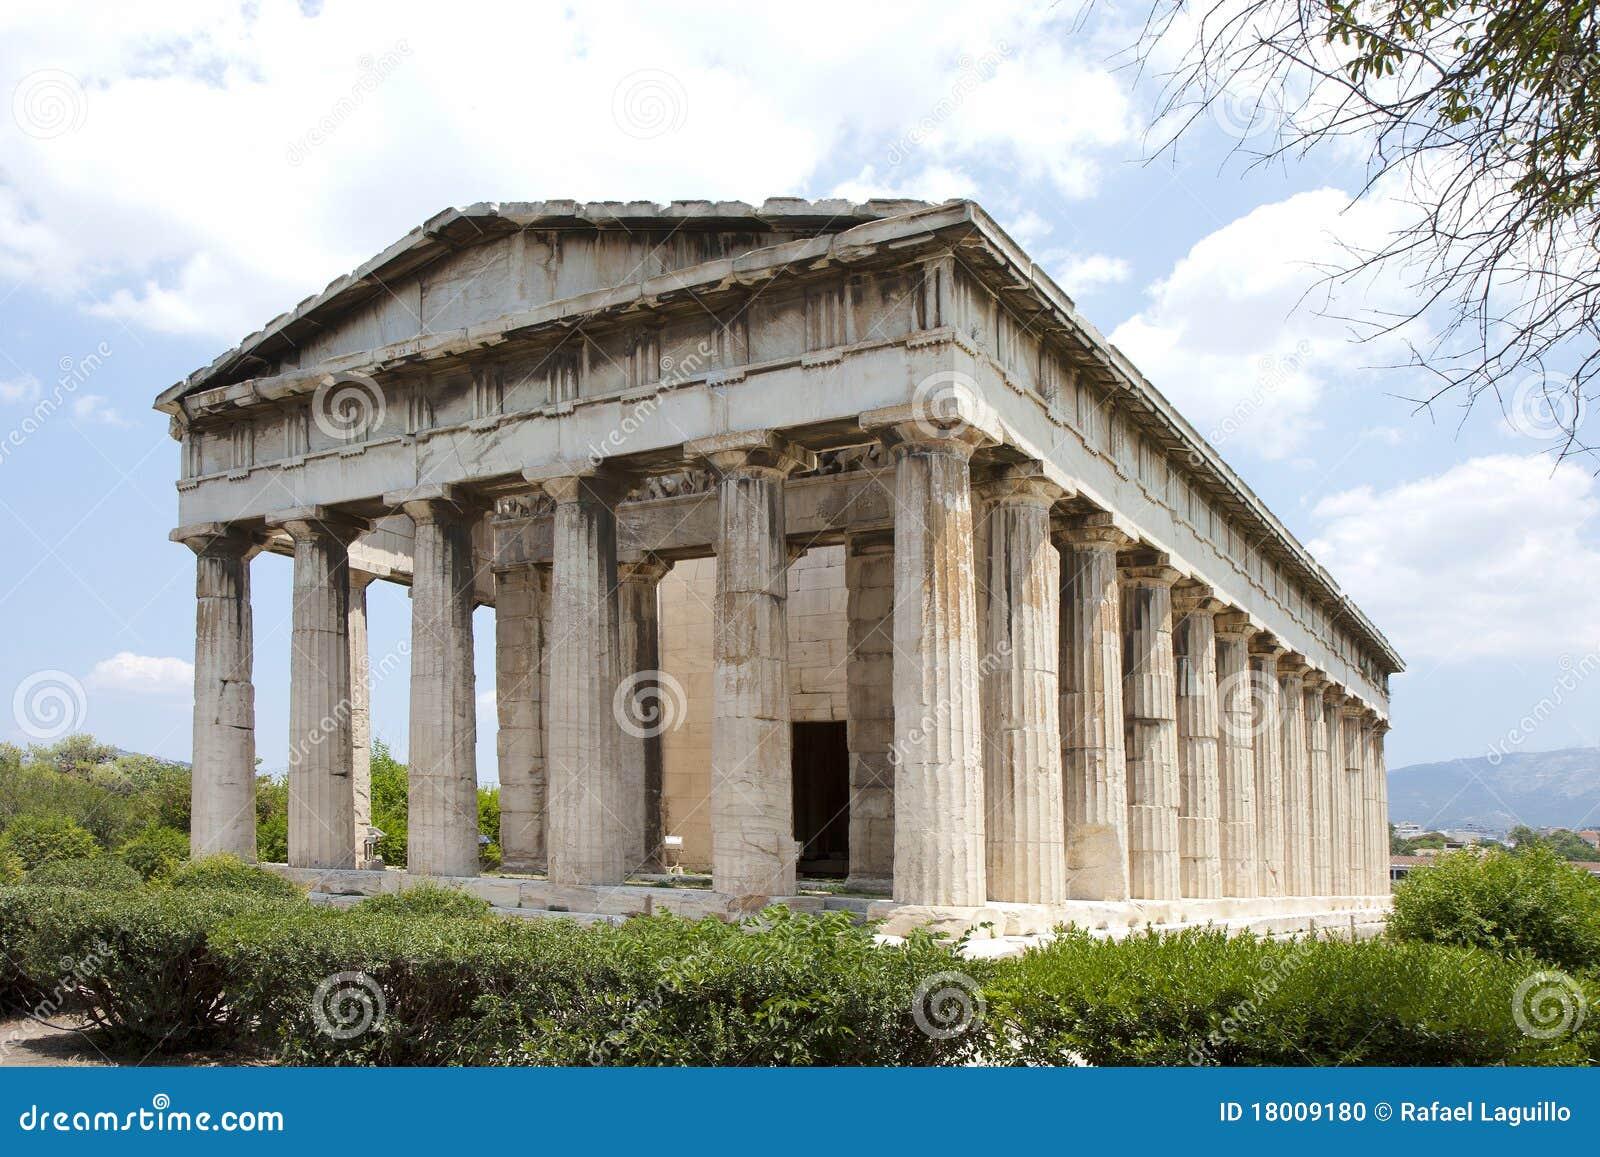 Temple Of Hephaestus. Athens, Grece. Stock Photo - Image ...